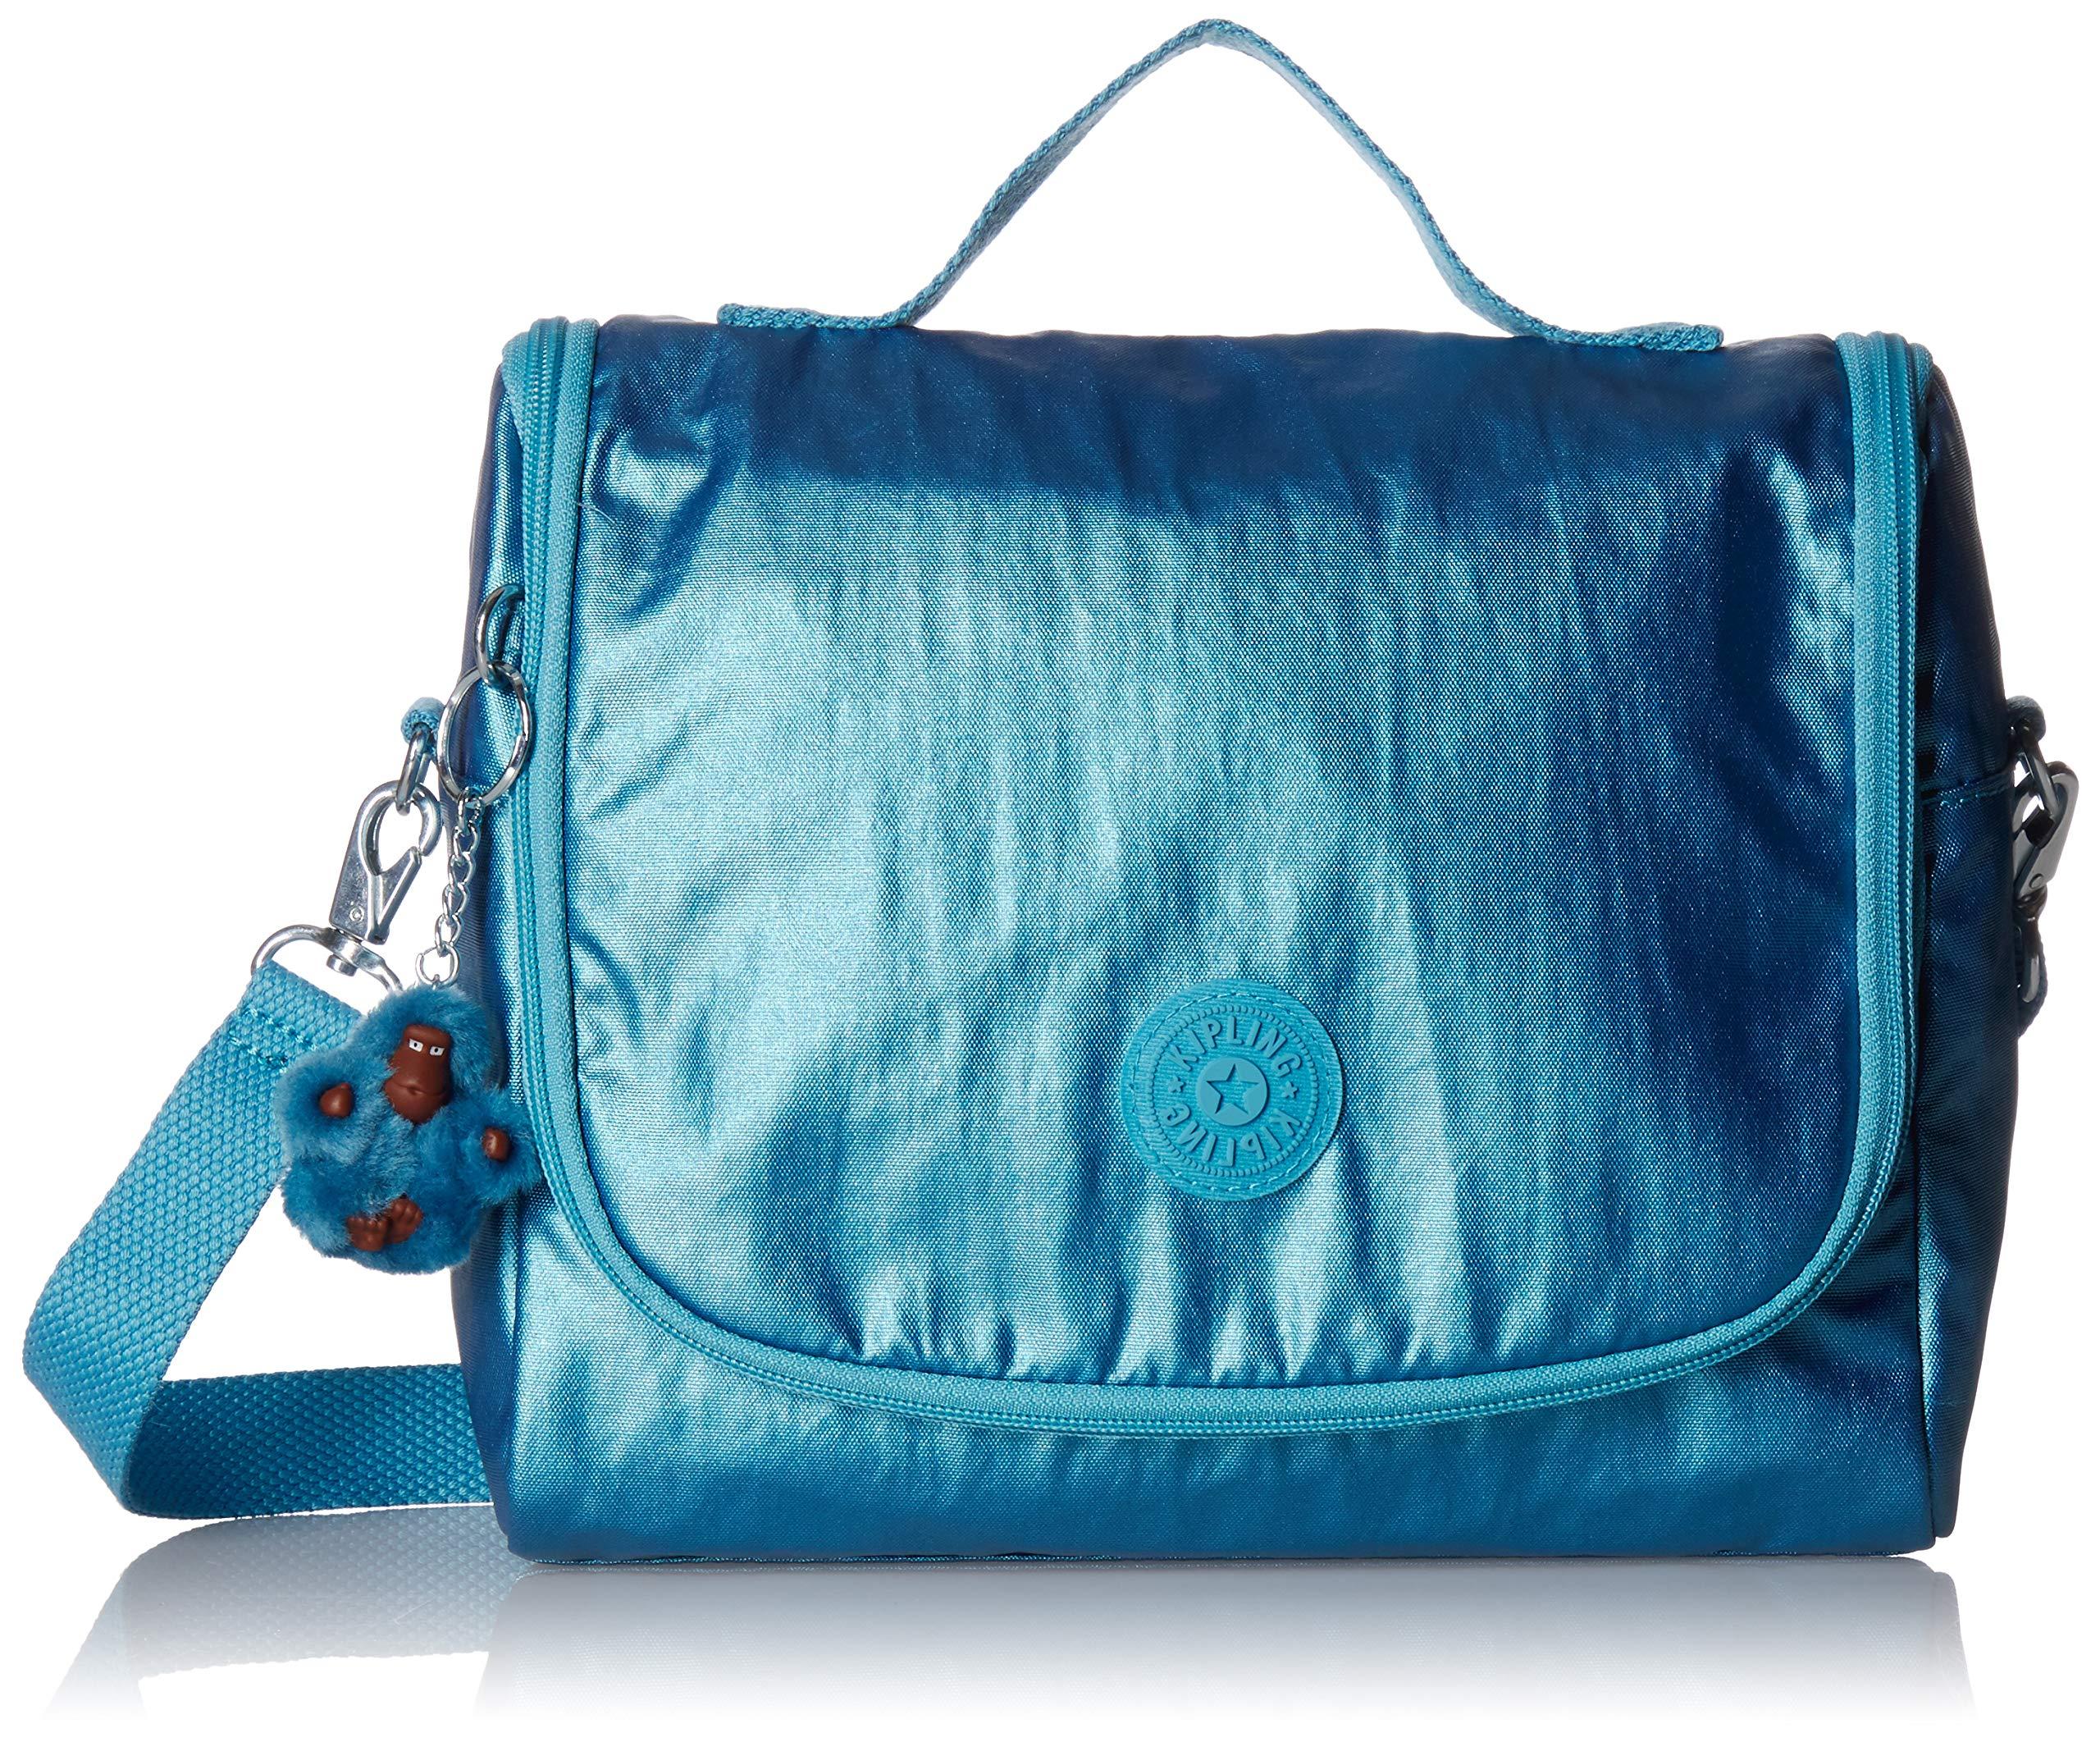 Kipling Kichirou Insulated Lunch Bag, Removable, Adjustable Crossbody Strap, Zip Closure, turkish tile metallic